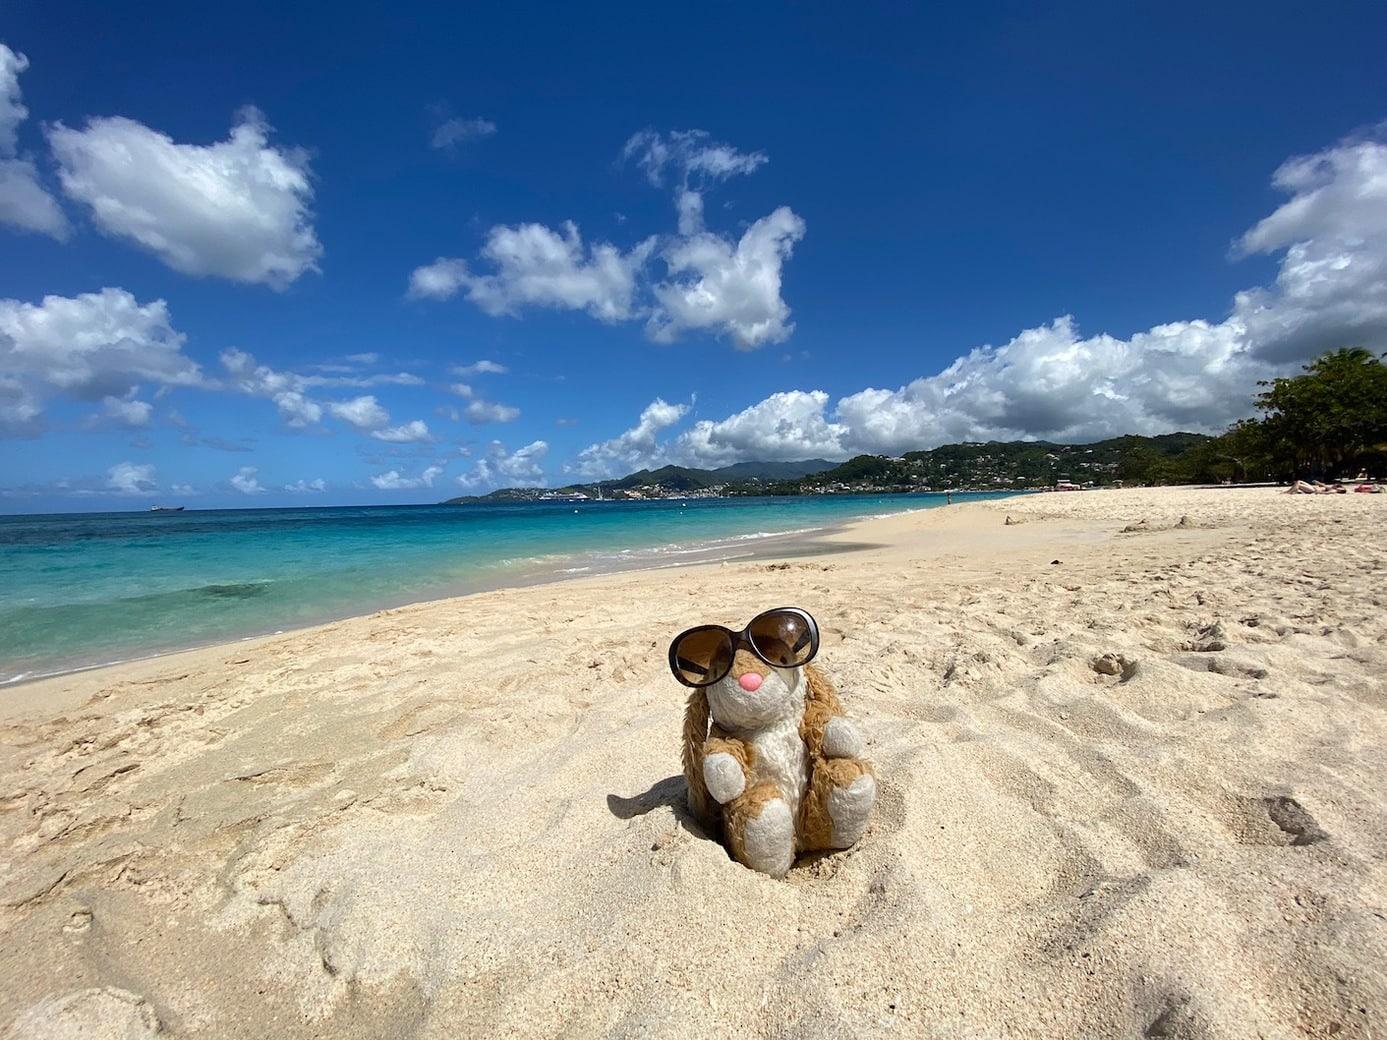 Grenada's most famous beach